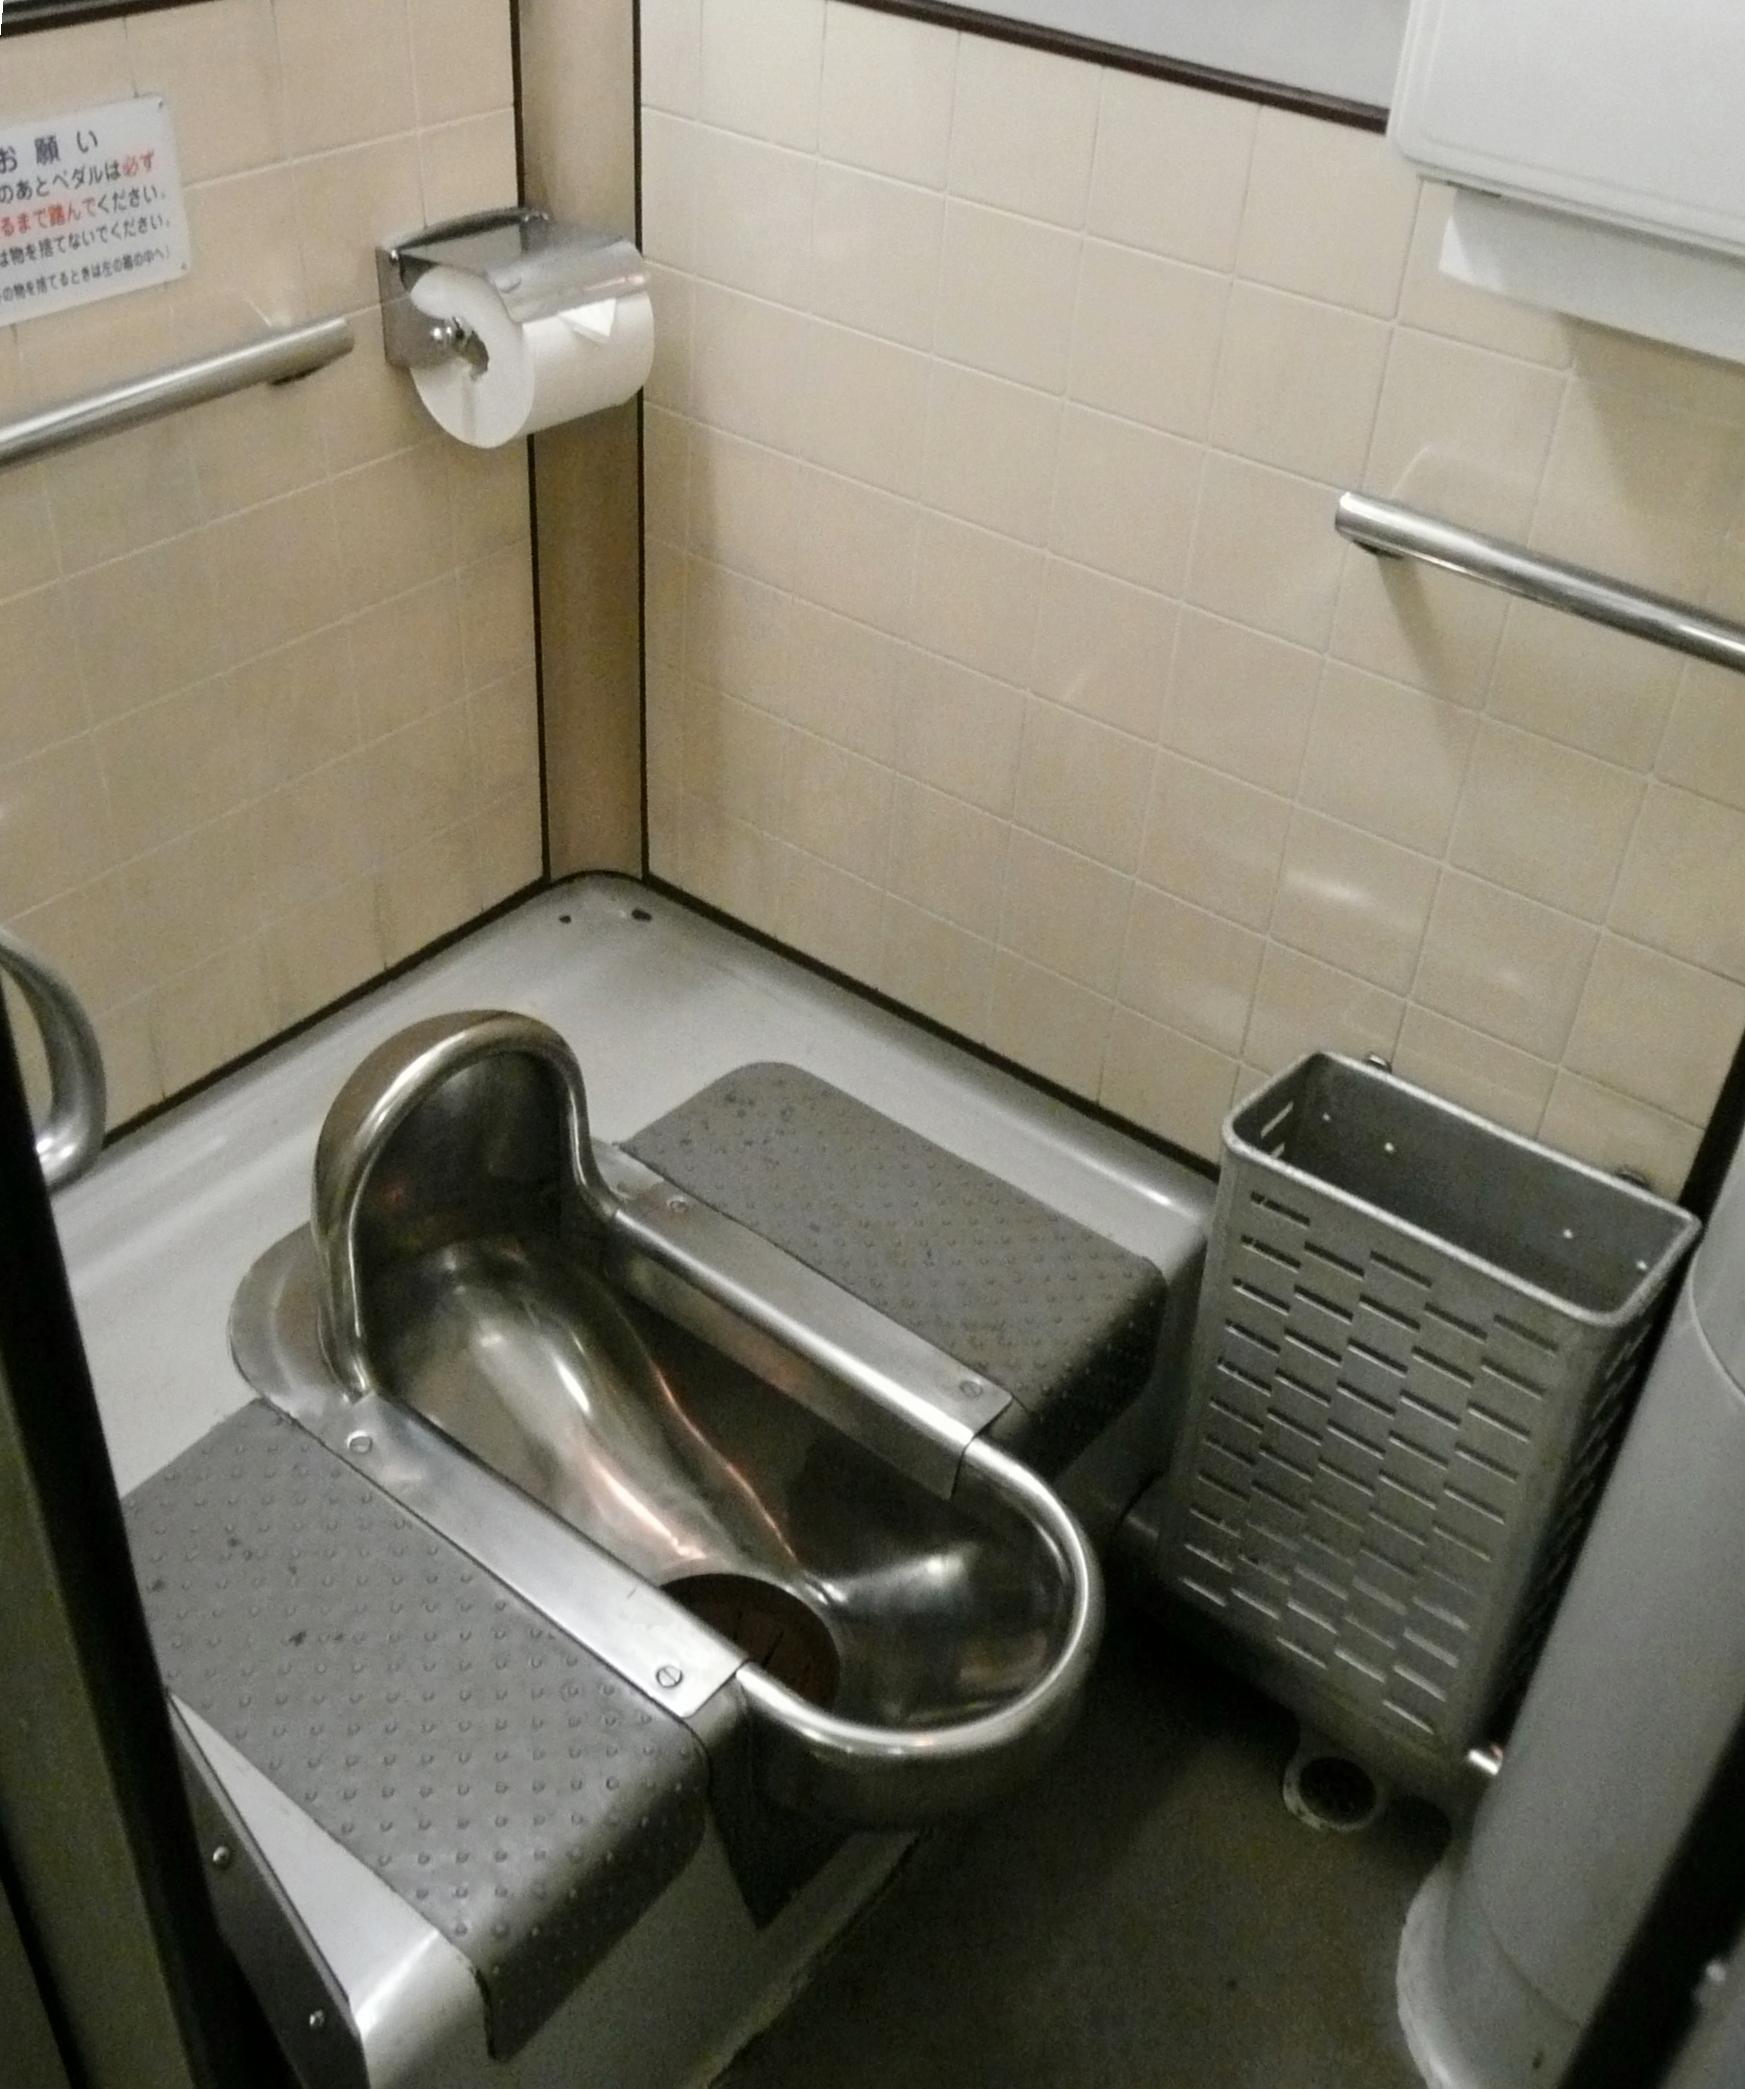 File:Ginga train japanese style toilet.jpg - Wikimedia Commons